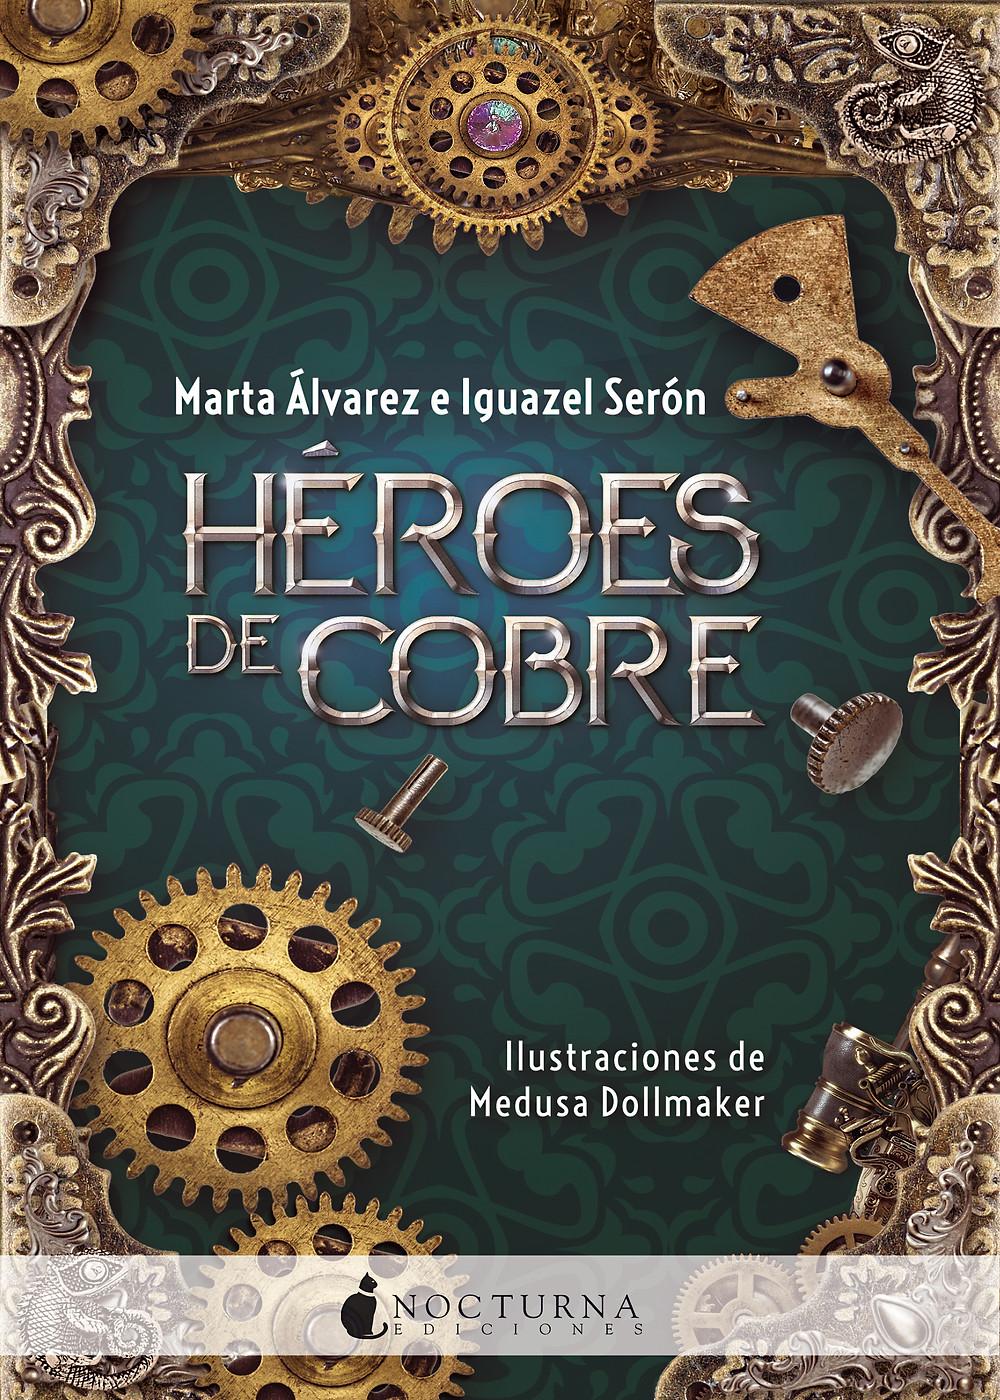 portada de héroes de cobre novela de fantasía steampunk escrita por marta alvarez e iguazel seron publicada por nocturna ediciones